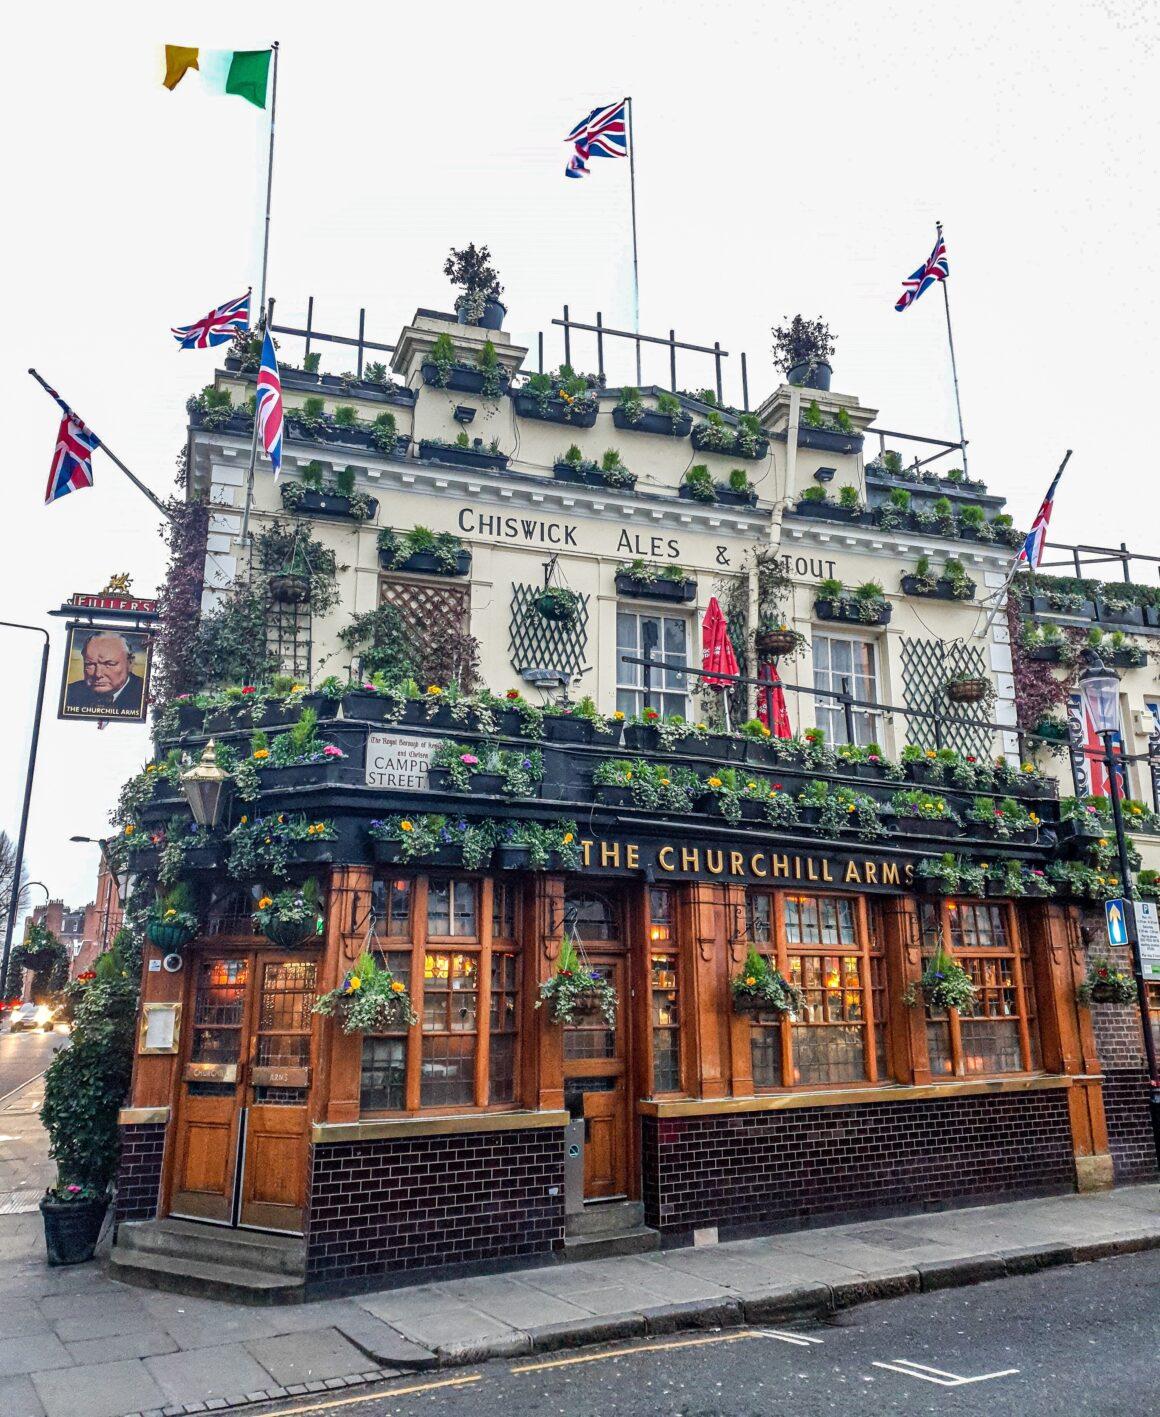 Exploring Kensington - The Churchill Arms Kensington - Hotels in Kensington